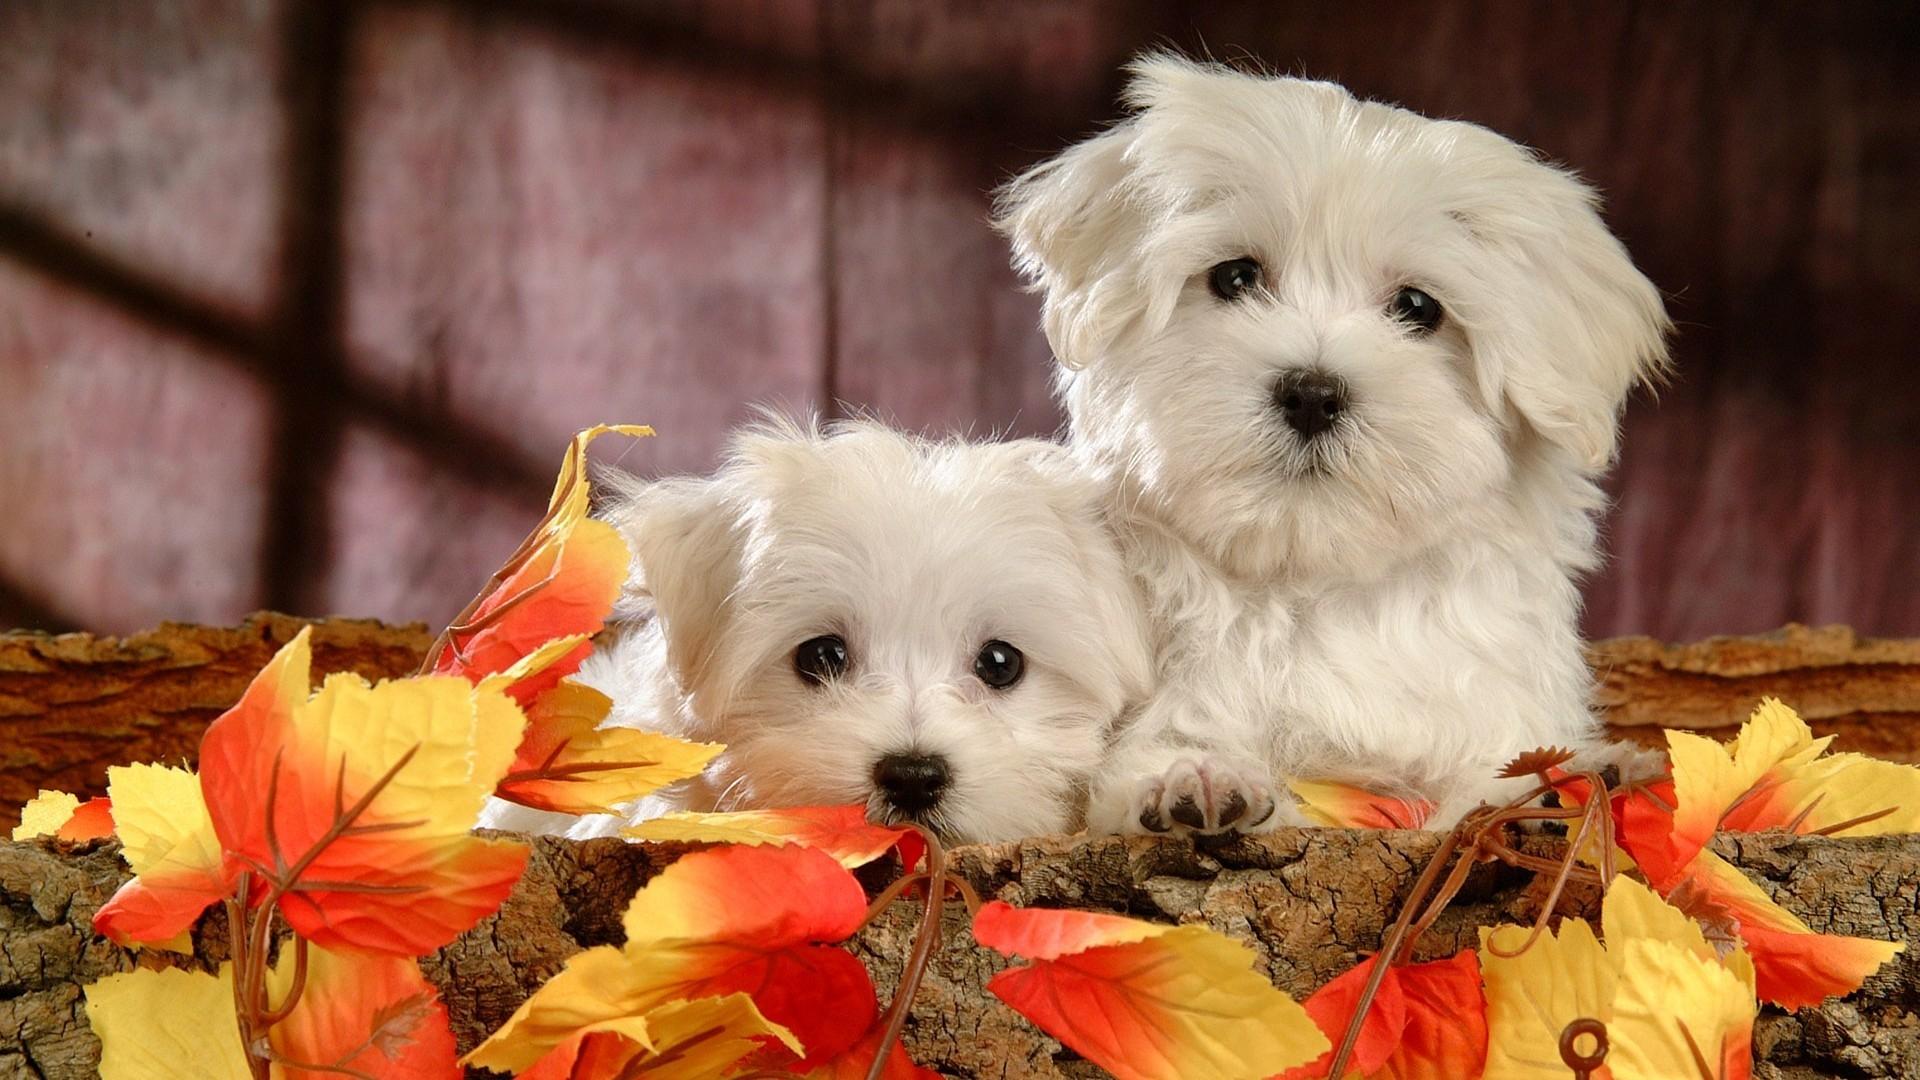 Pitbull Wallpapers 3d Die 74 Besten Hunde Hintergrundbilder